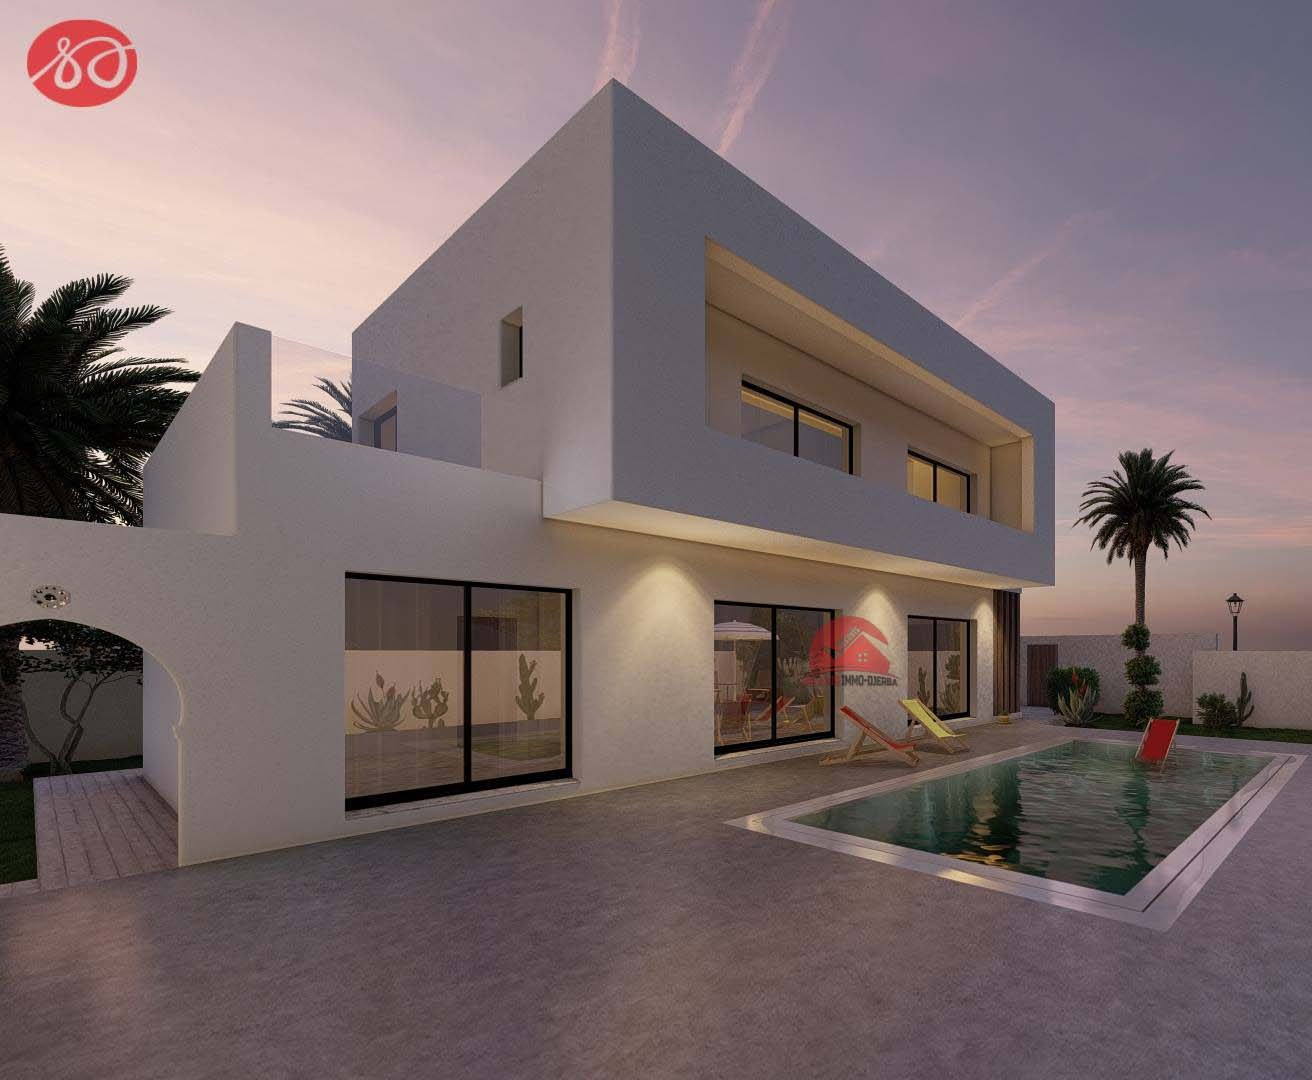 Immobilier neuf à Djerba proche plage - Réf P 530